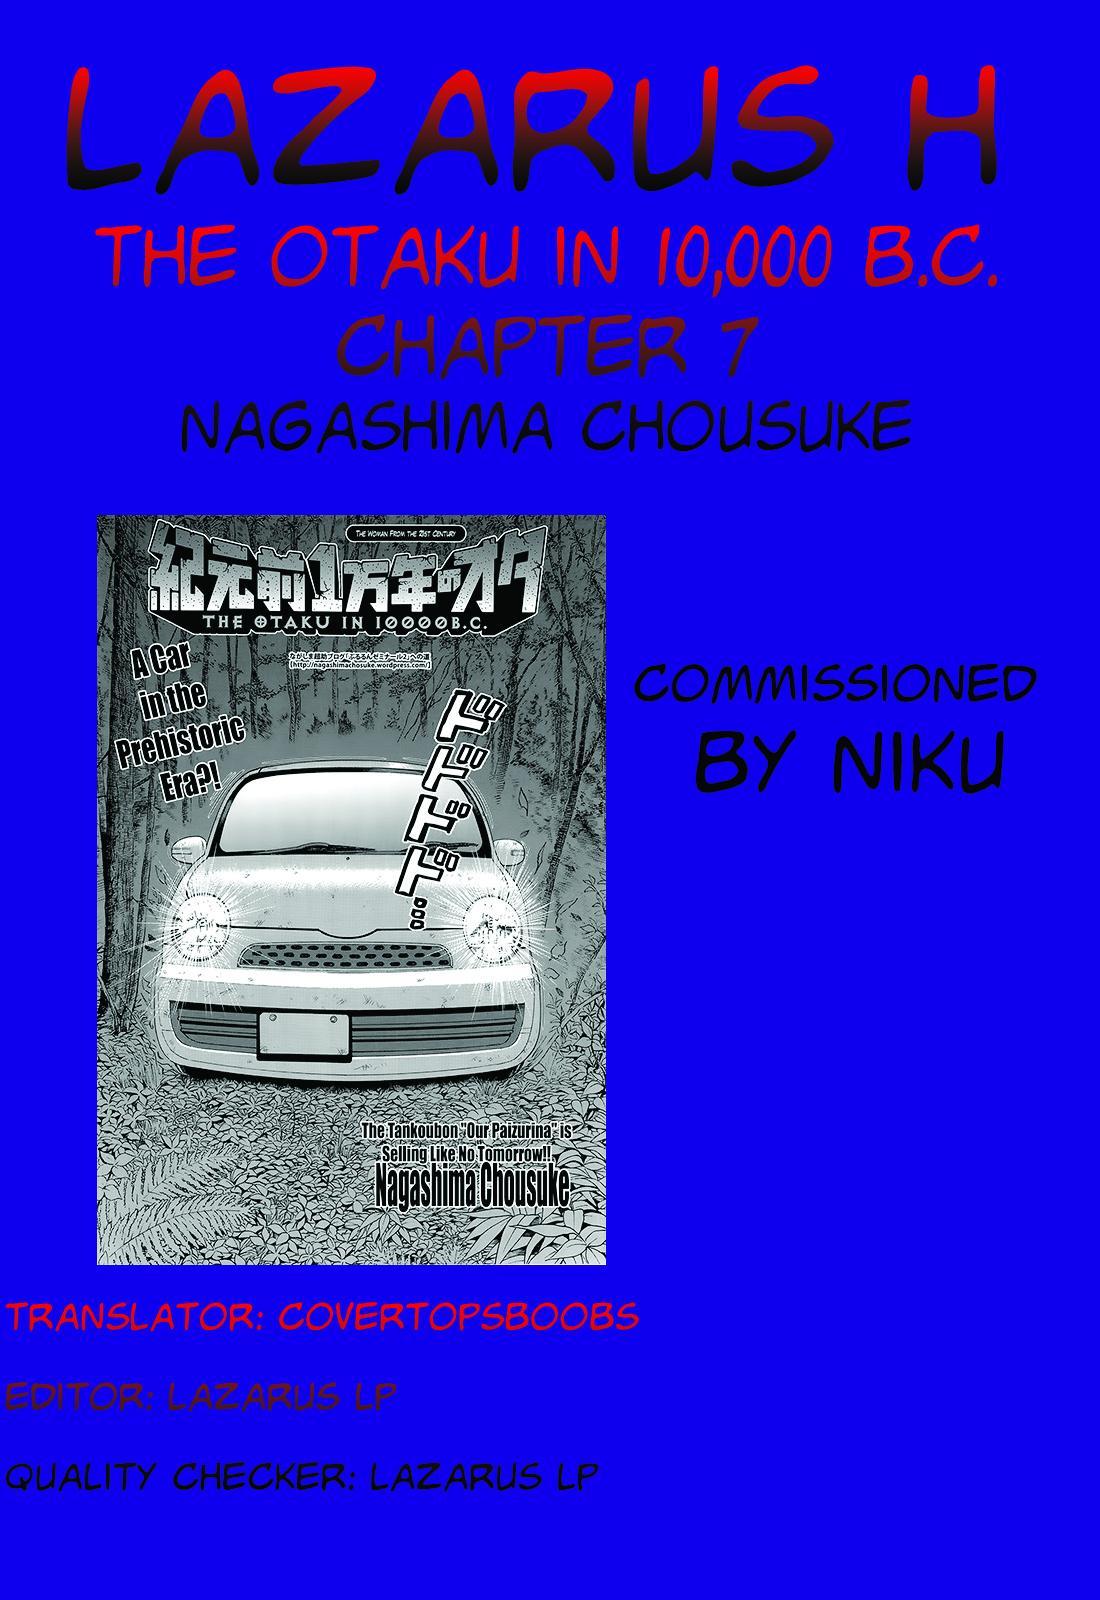 Kigenzen 10000 Nen no Ota   The Otaku in 10,000 B.C. Ch. 1-22 136